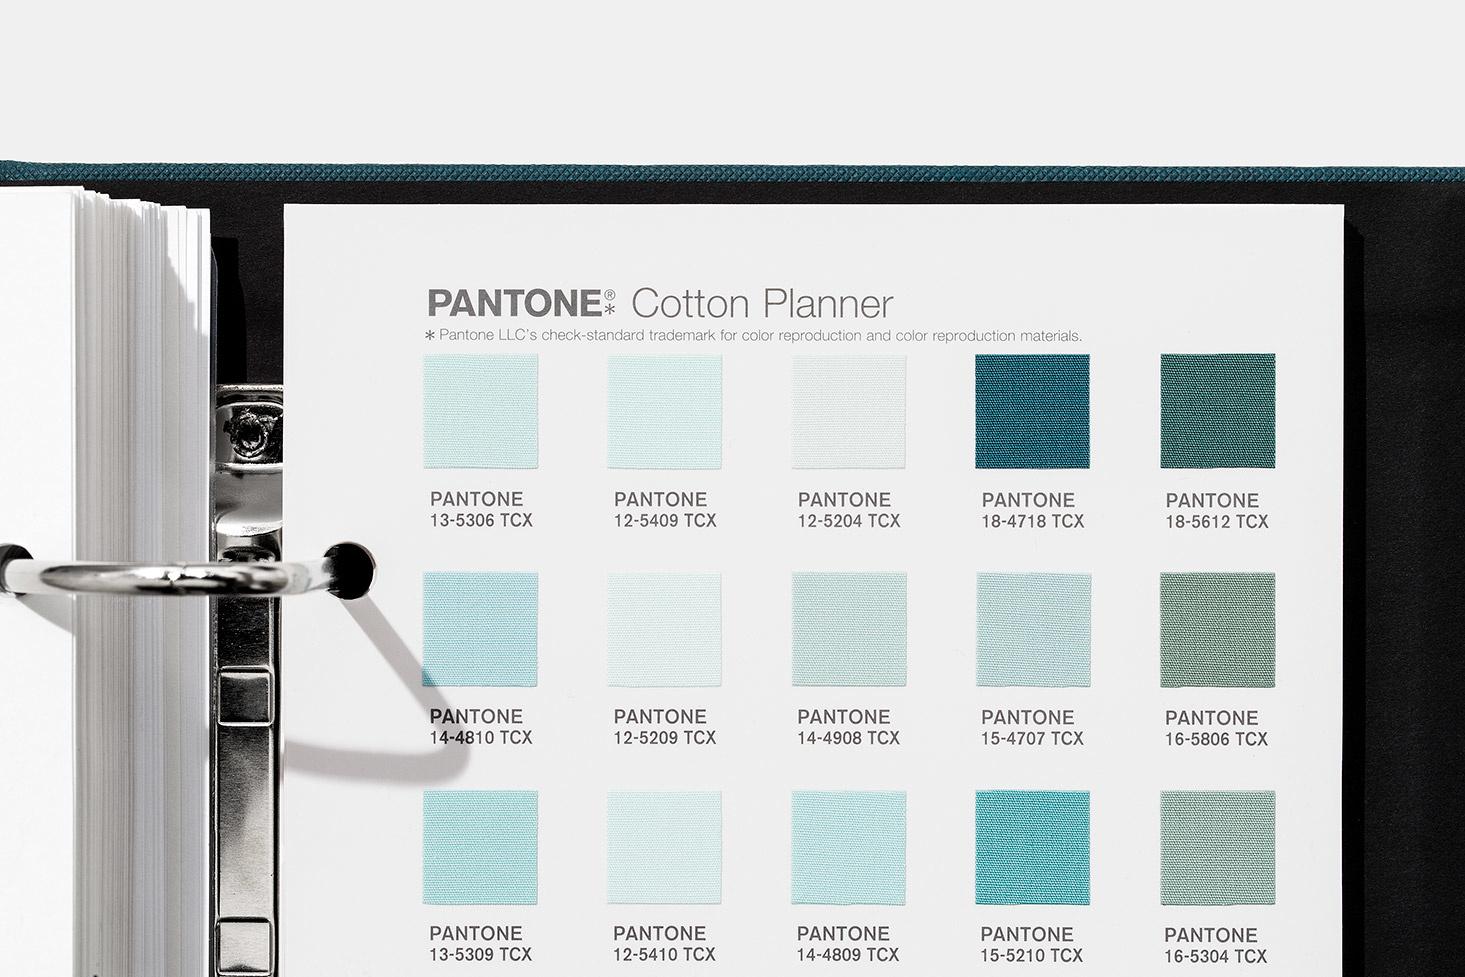 PANTONE PANTONE Fashion & Home Cotton Planner - 2015